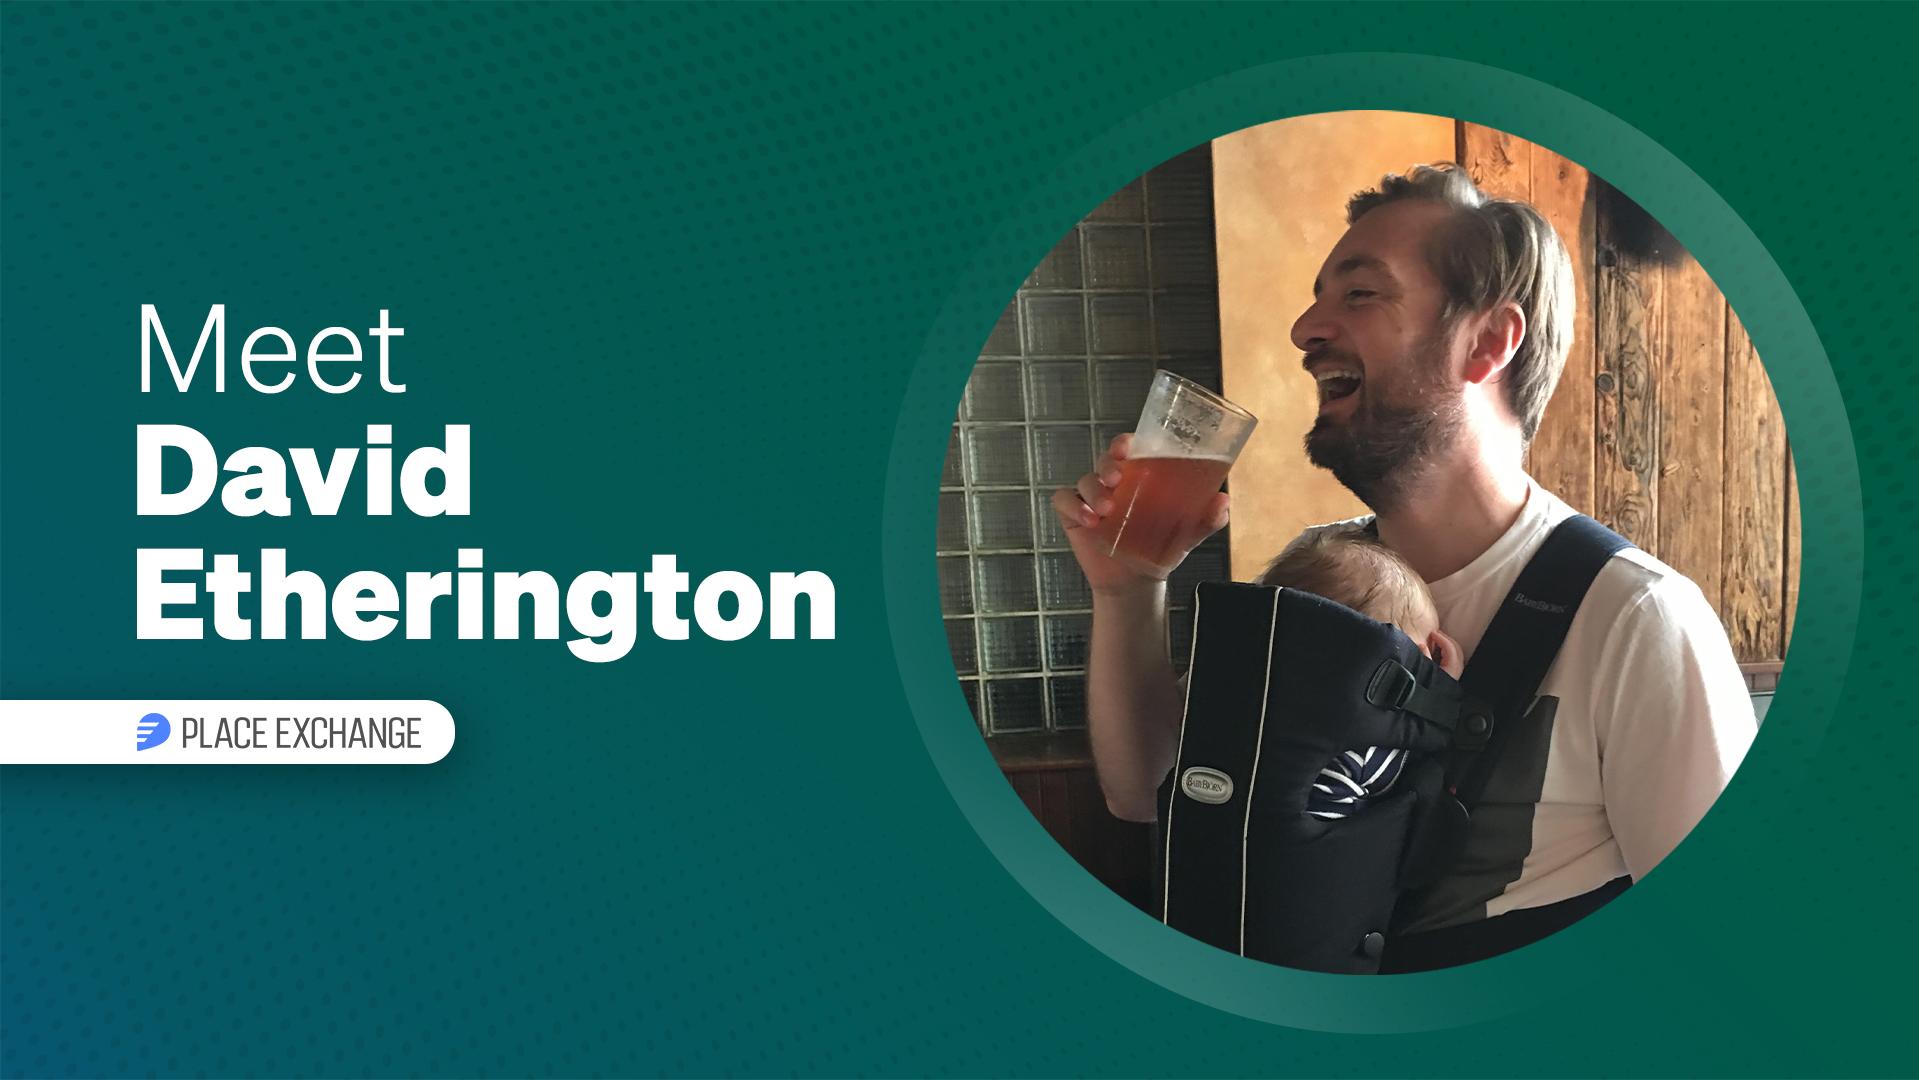 Meet Our Partners: Dave Etherington, Place Exchange